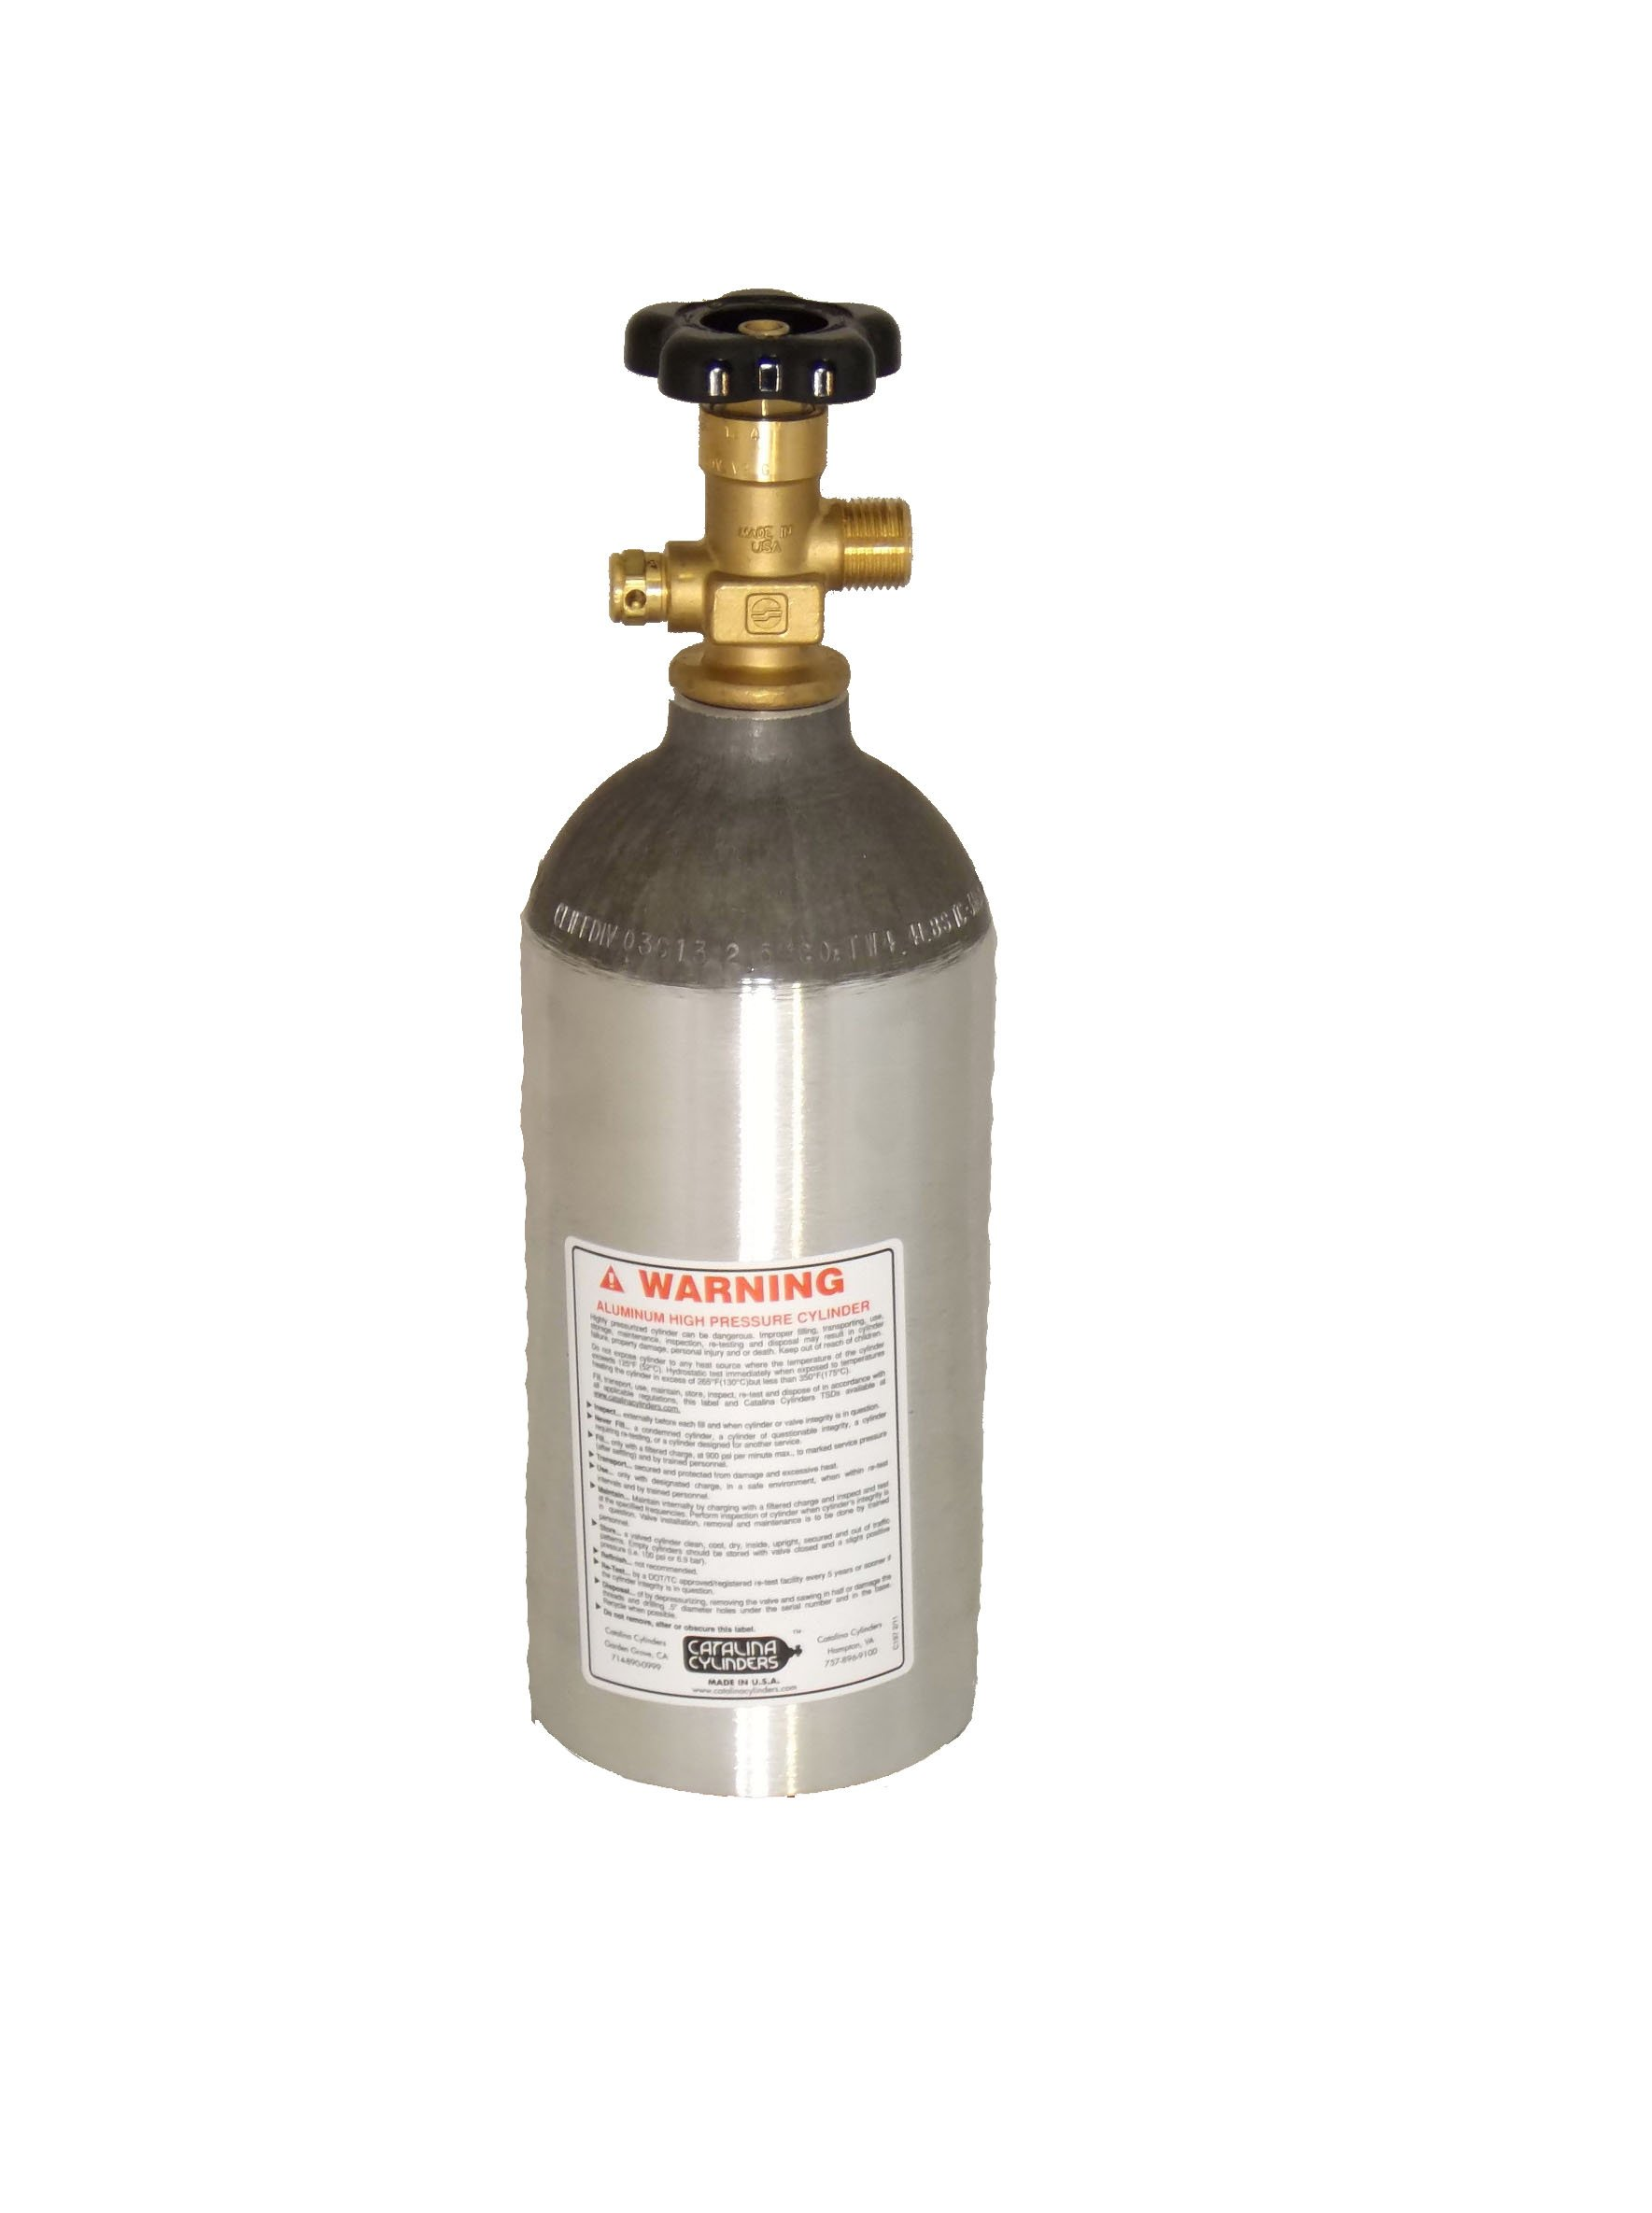 CO2 2.5 Pound Aluminum Cylinder Tank New - Sherwood CGA 320 Valve, Bar Keg Draft Beer Tap Kegerator (Shipped Empty)